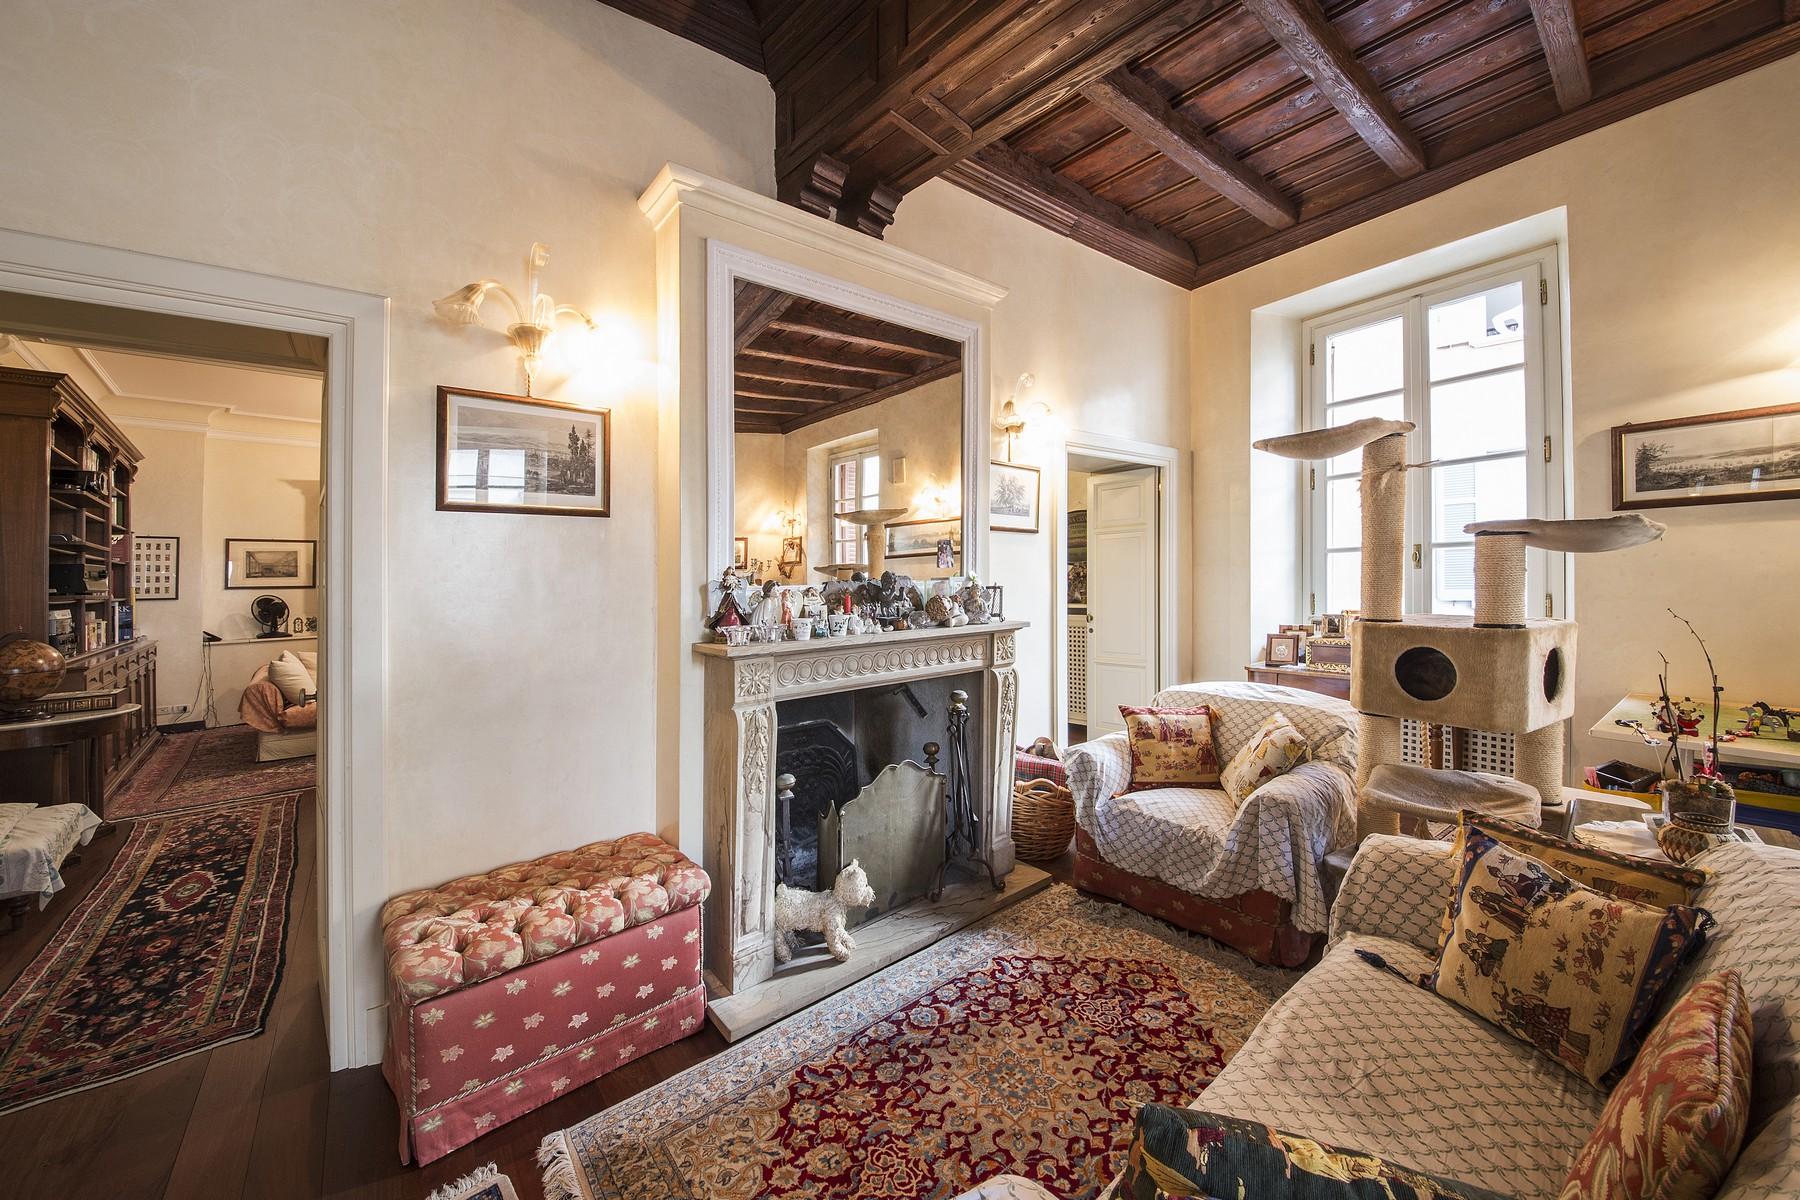 Additional photo for property listing at Wonderful apartment in prestigious building in the center of Como Via Bonanomi Como, Como 22100 Italy